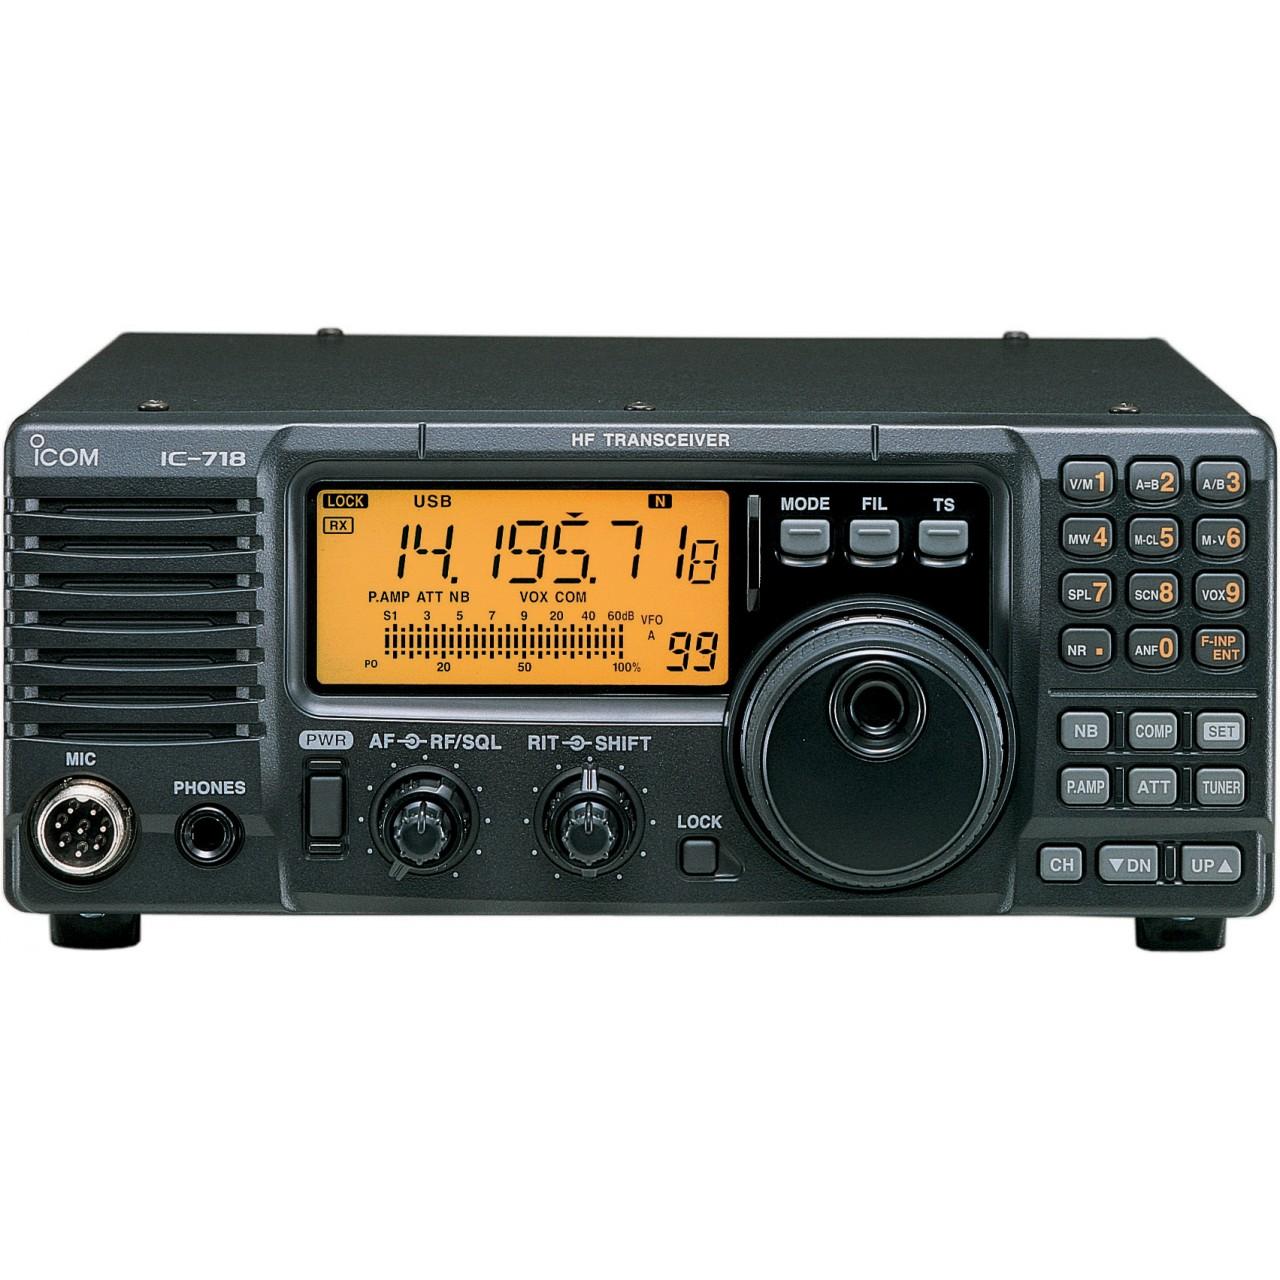 PACK-718 Bases - ICOM